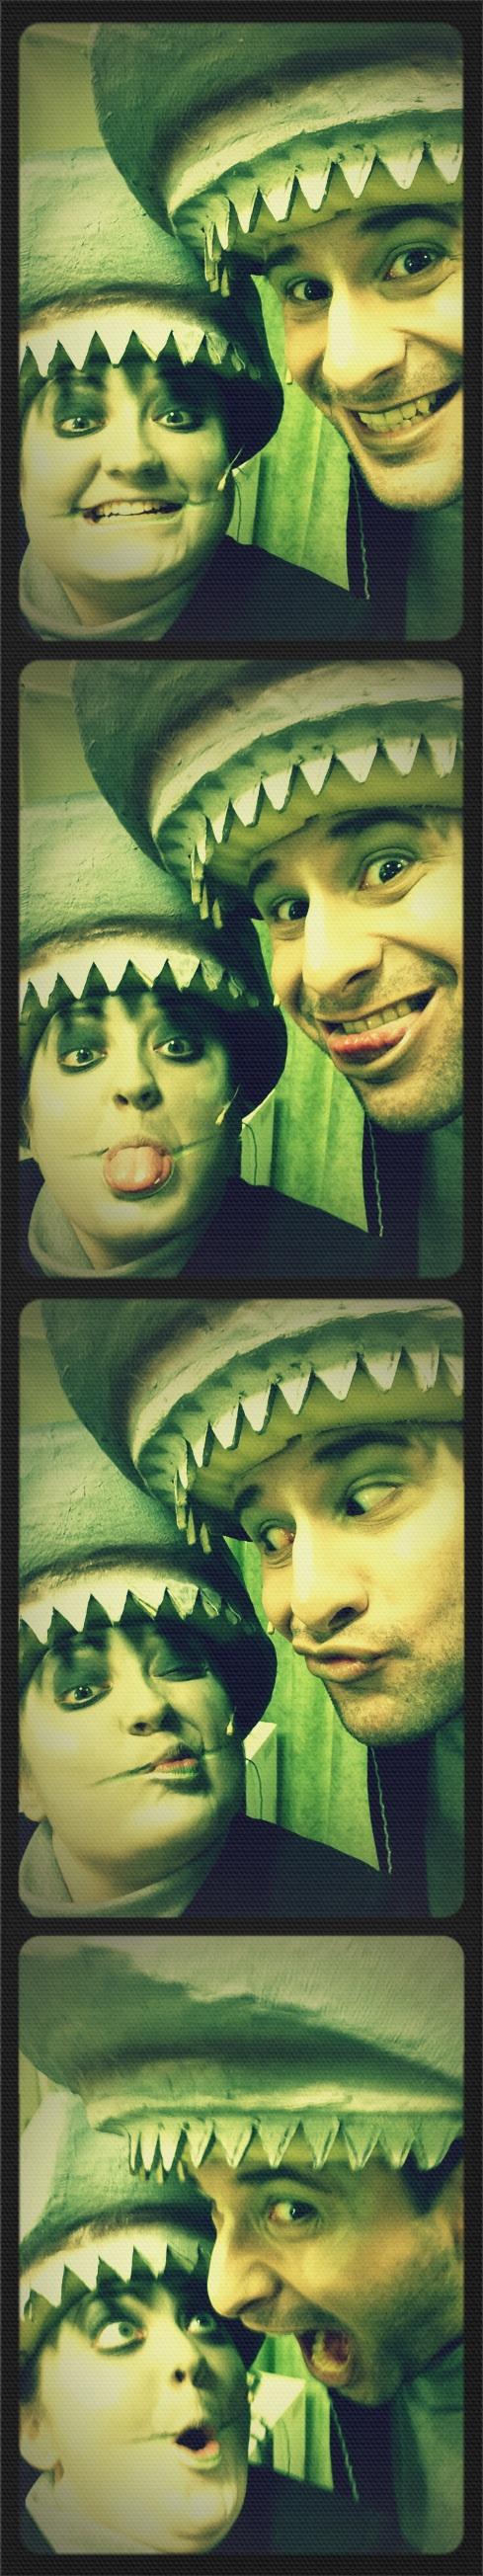 Crazy Sharks